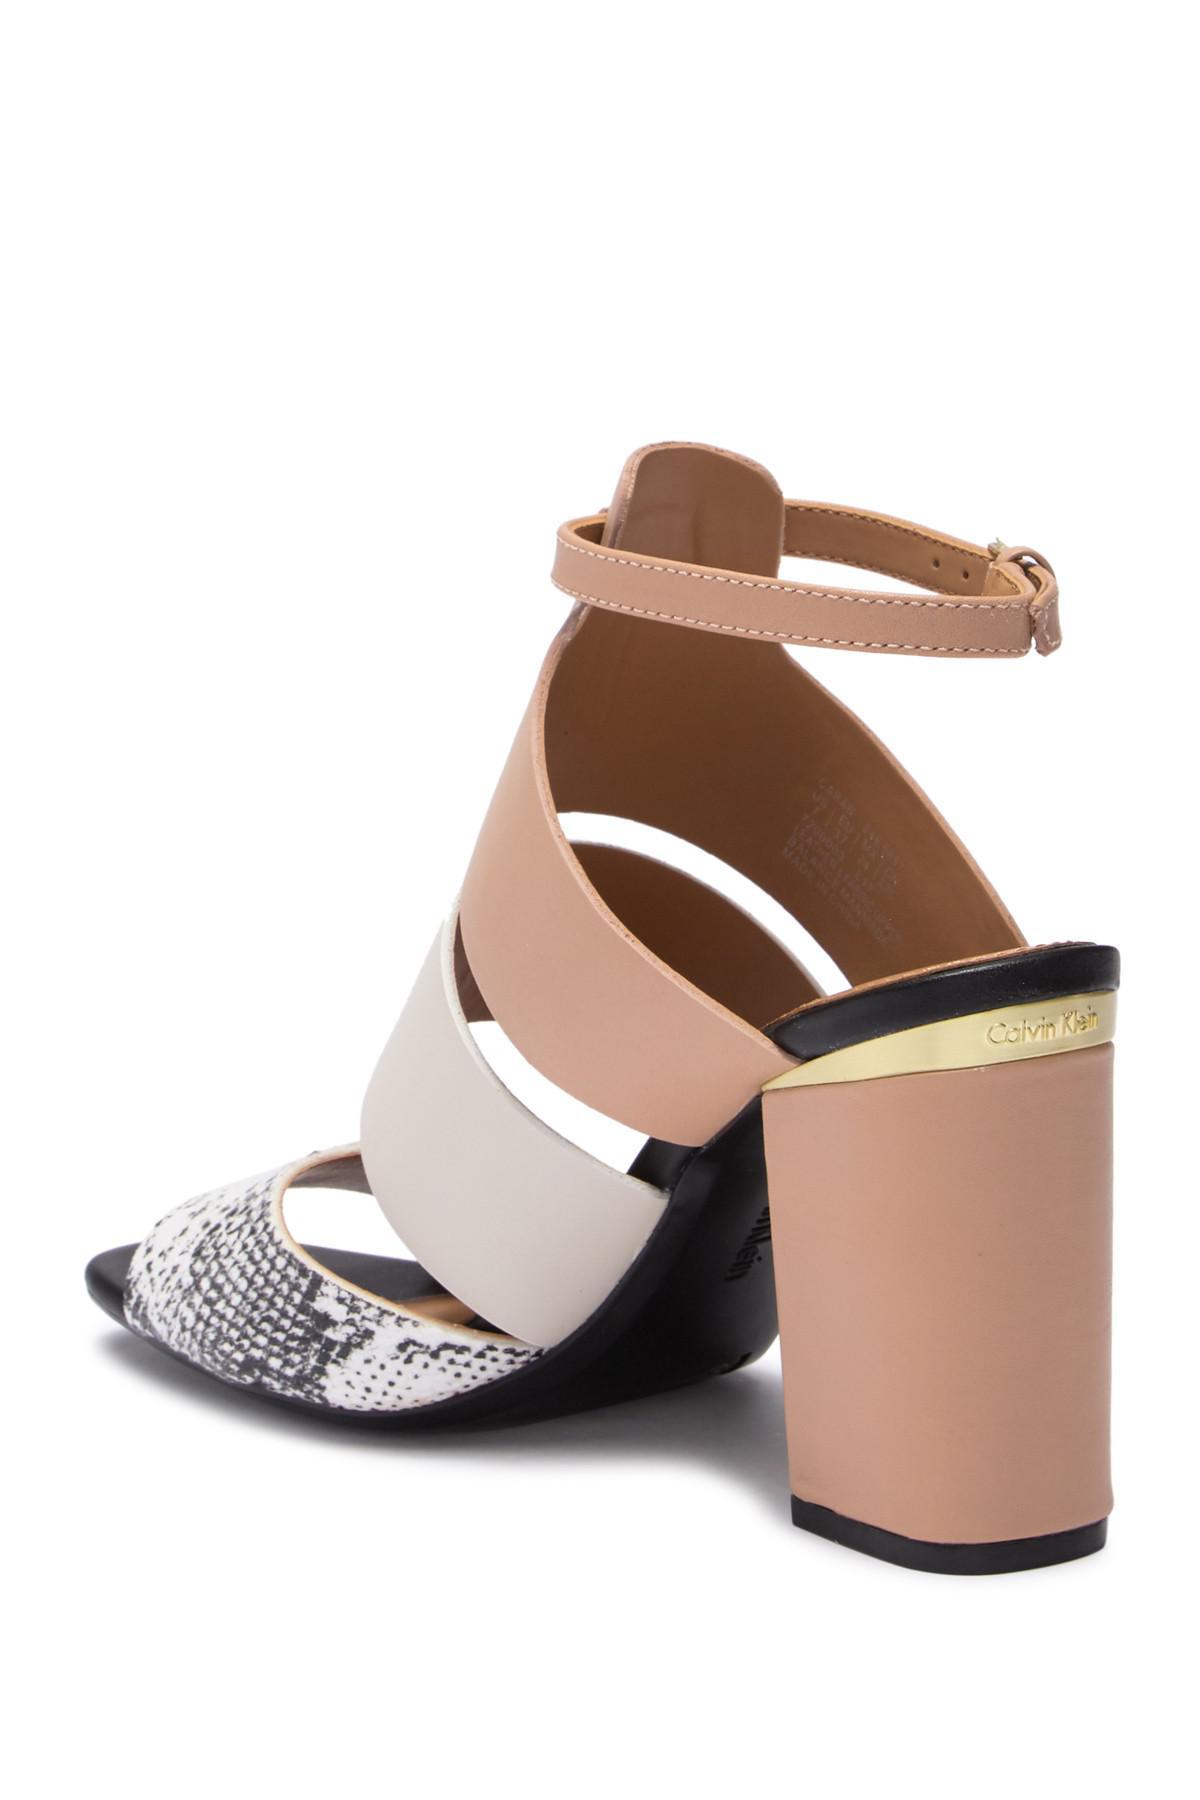 fe13568e27c Lyst - Calvin Klein Caran Mamba Block Heel Sandal